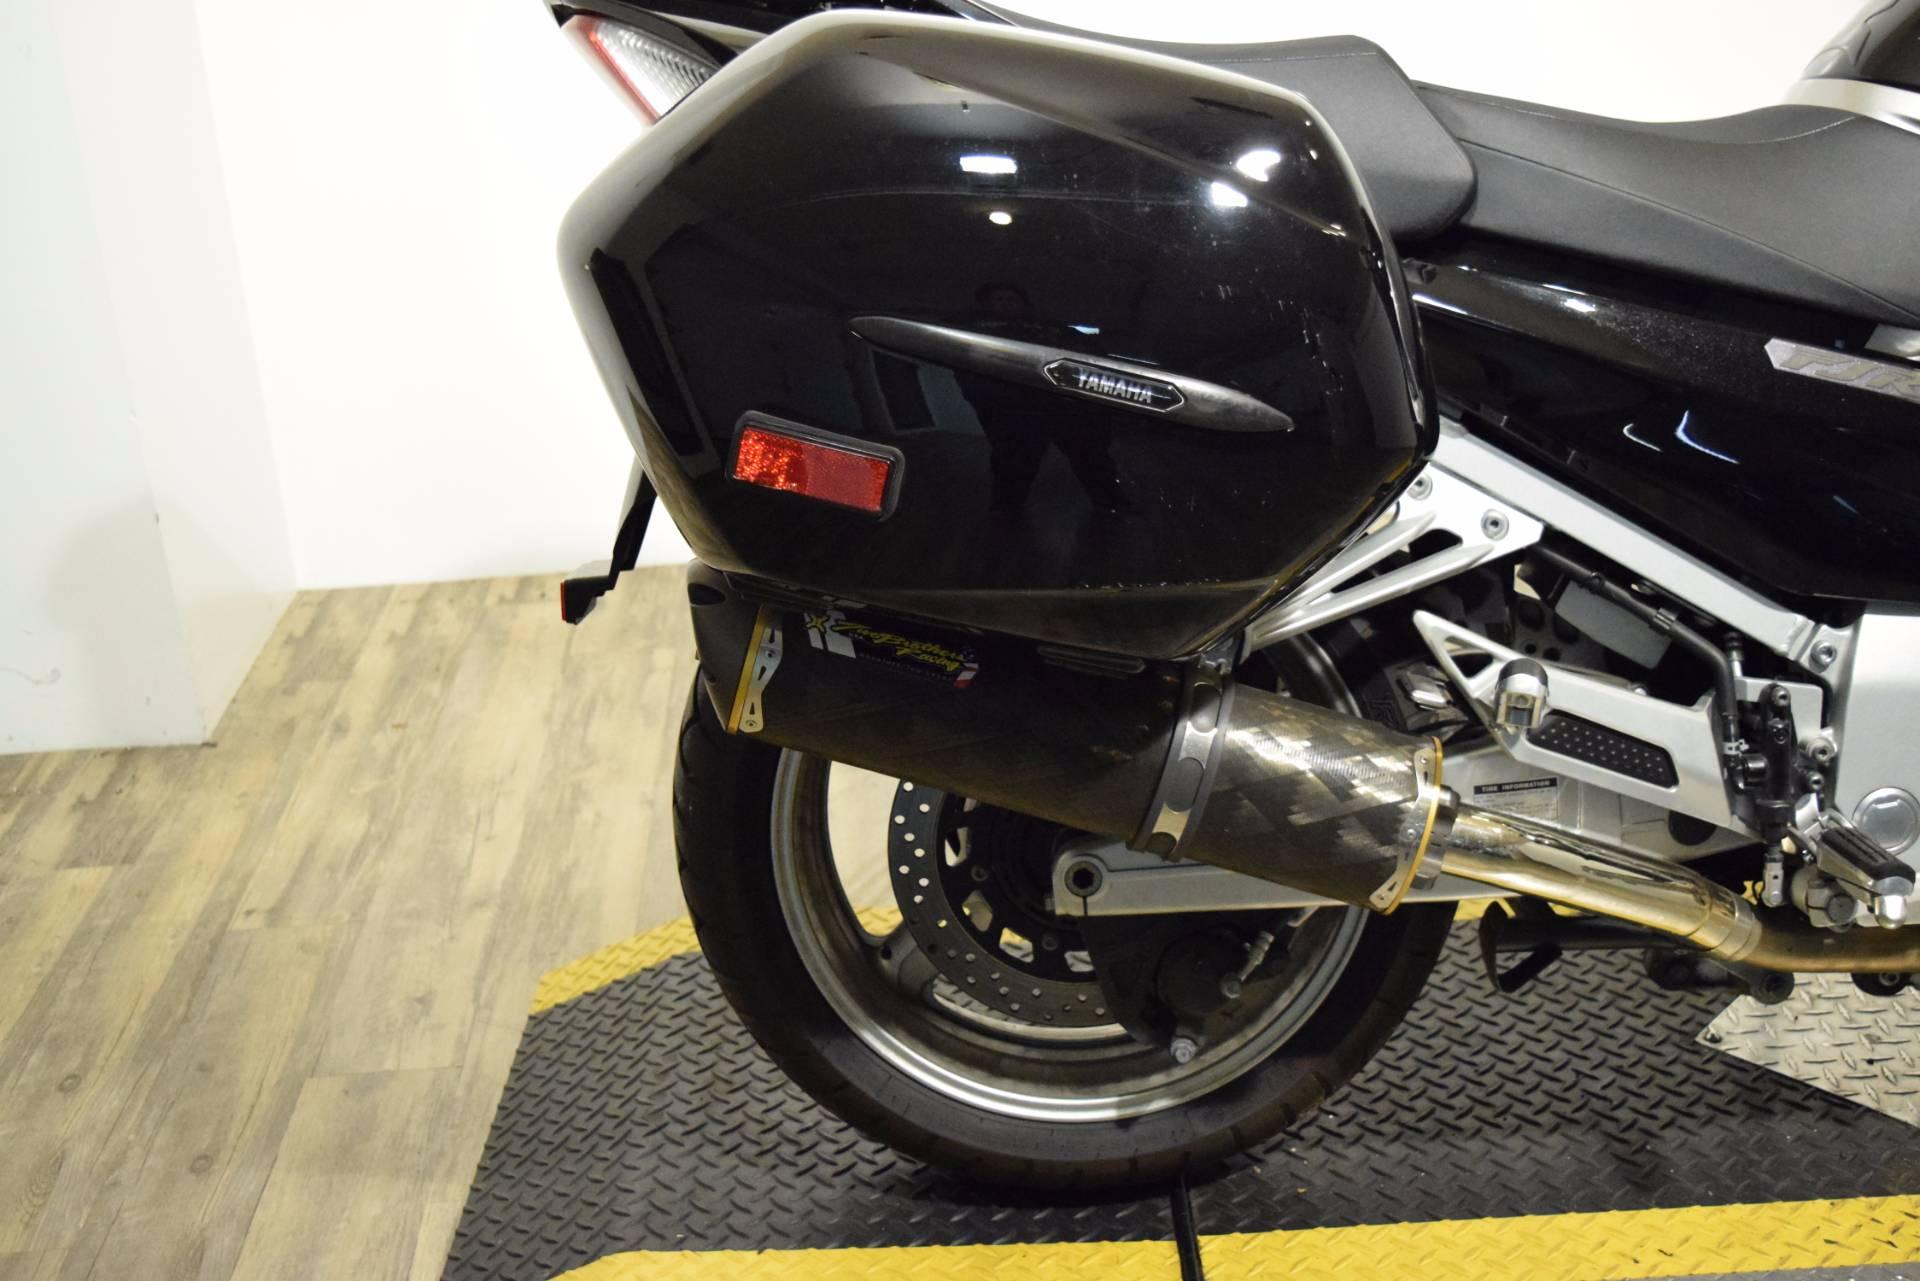 2008 Yamaha FJR 1300A 9